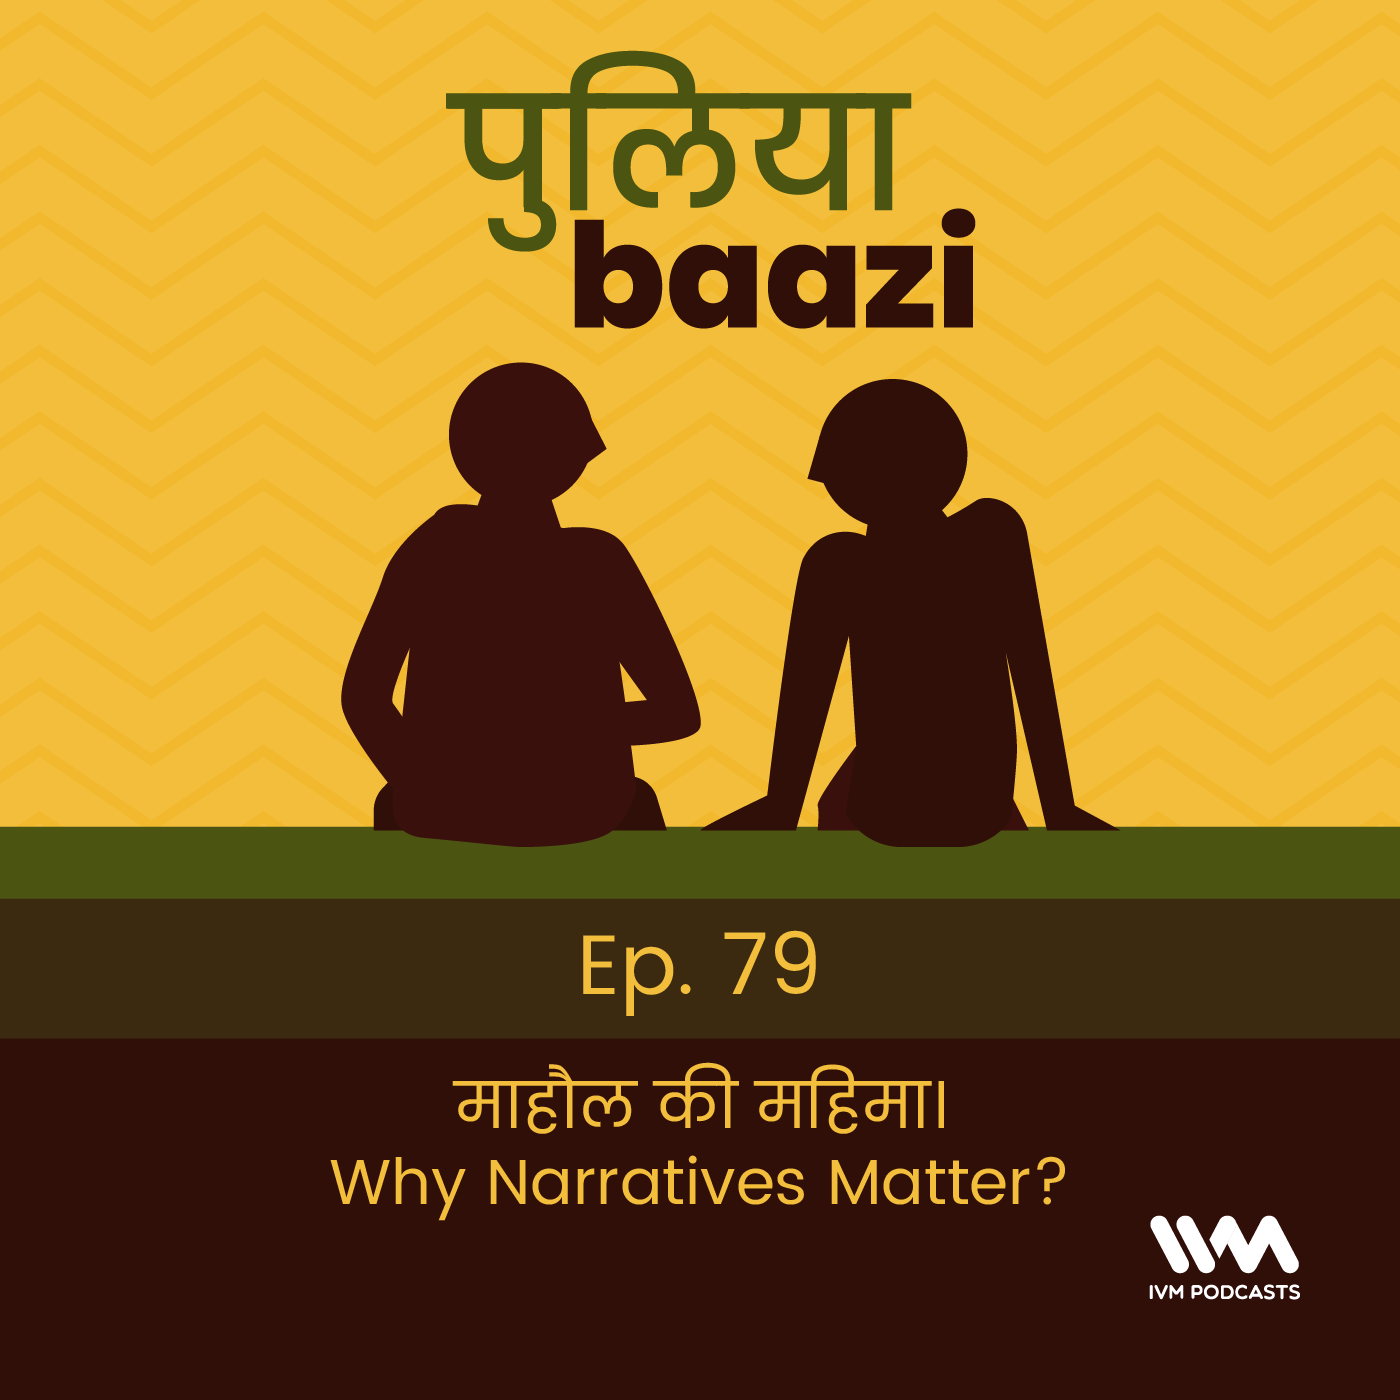 Ep. 79: माहौल की महिमा। Why Narratives Matter?